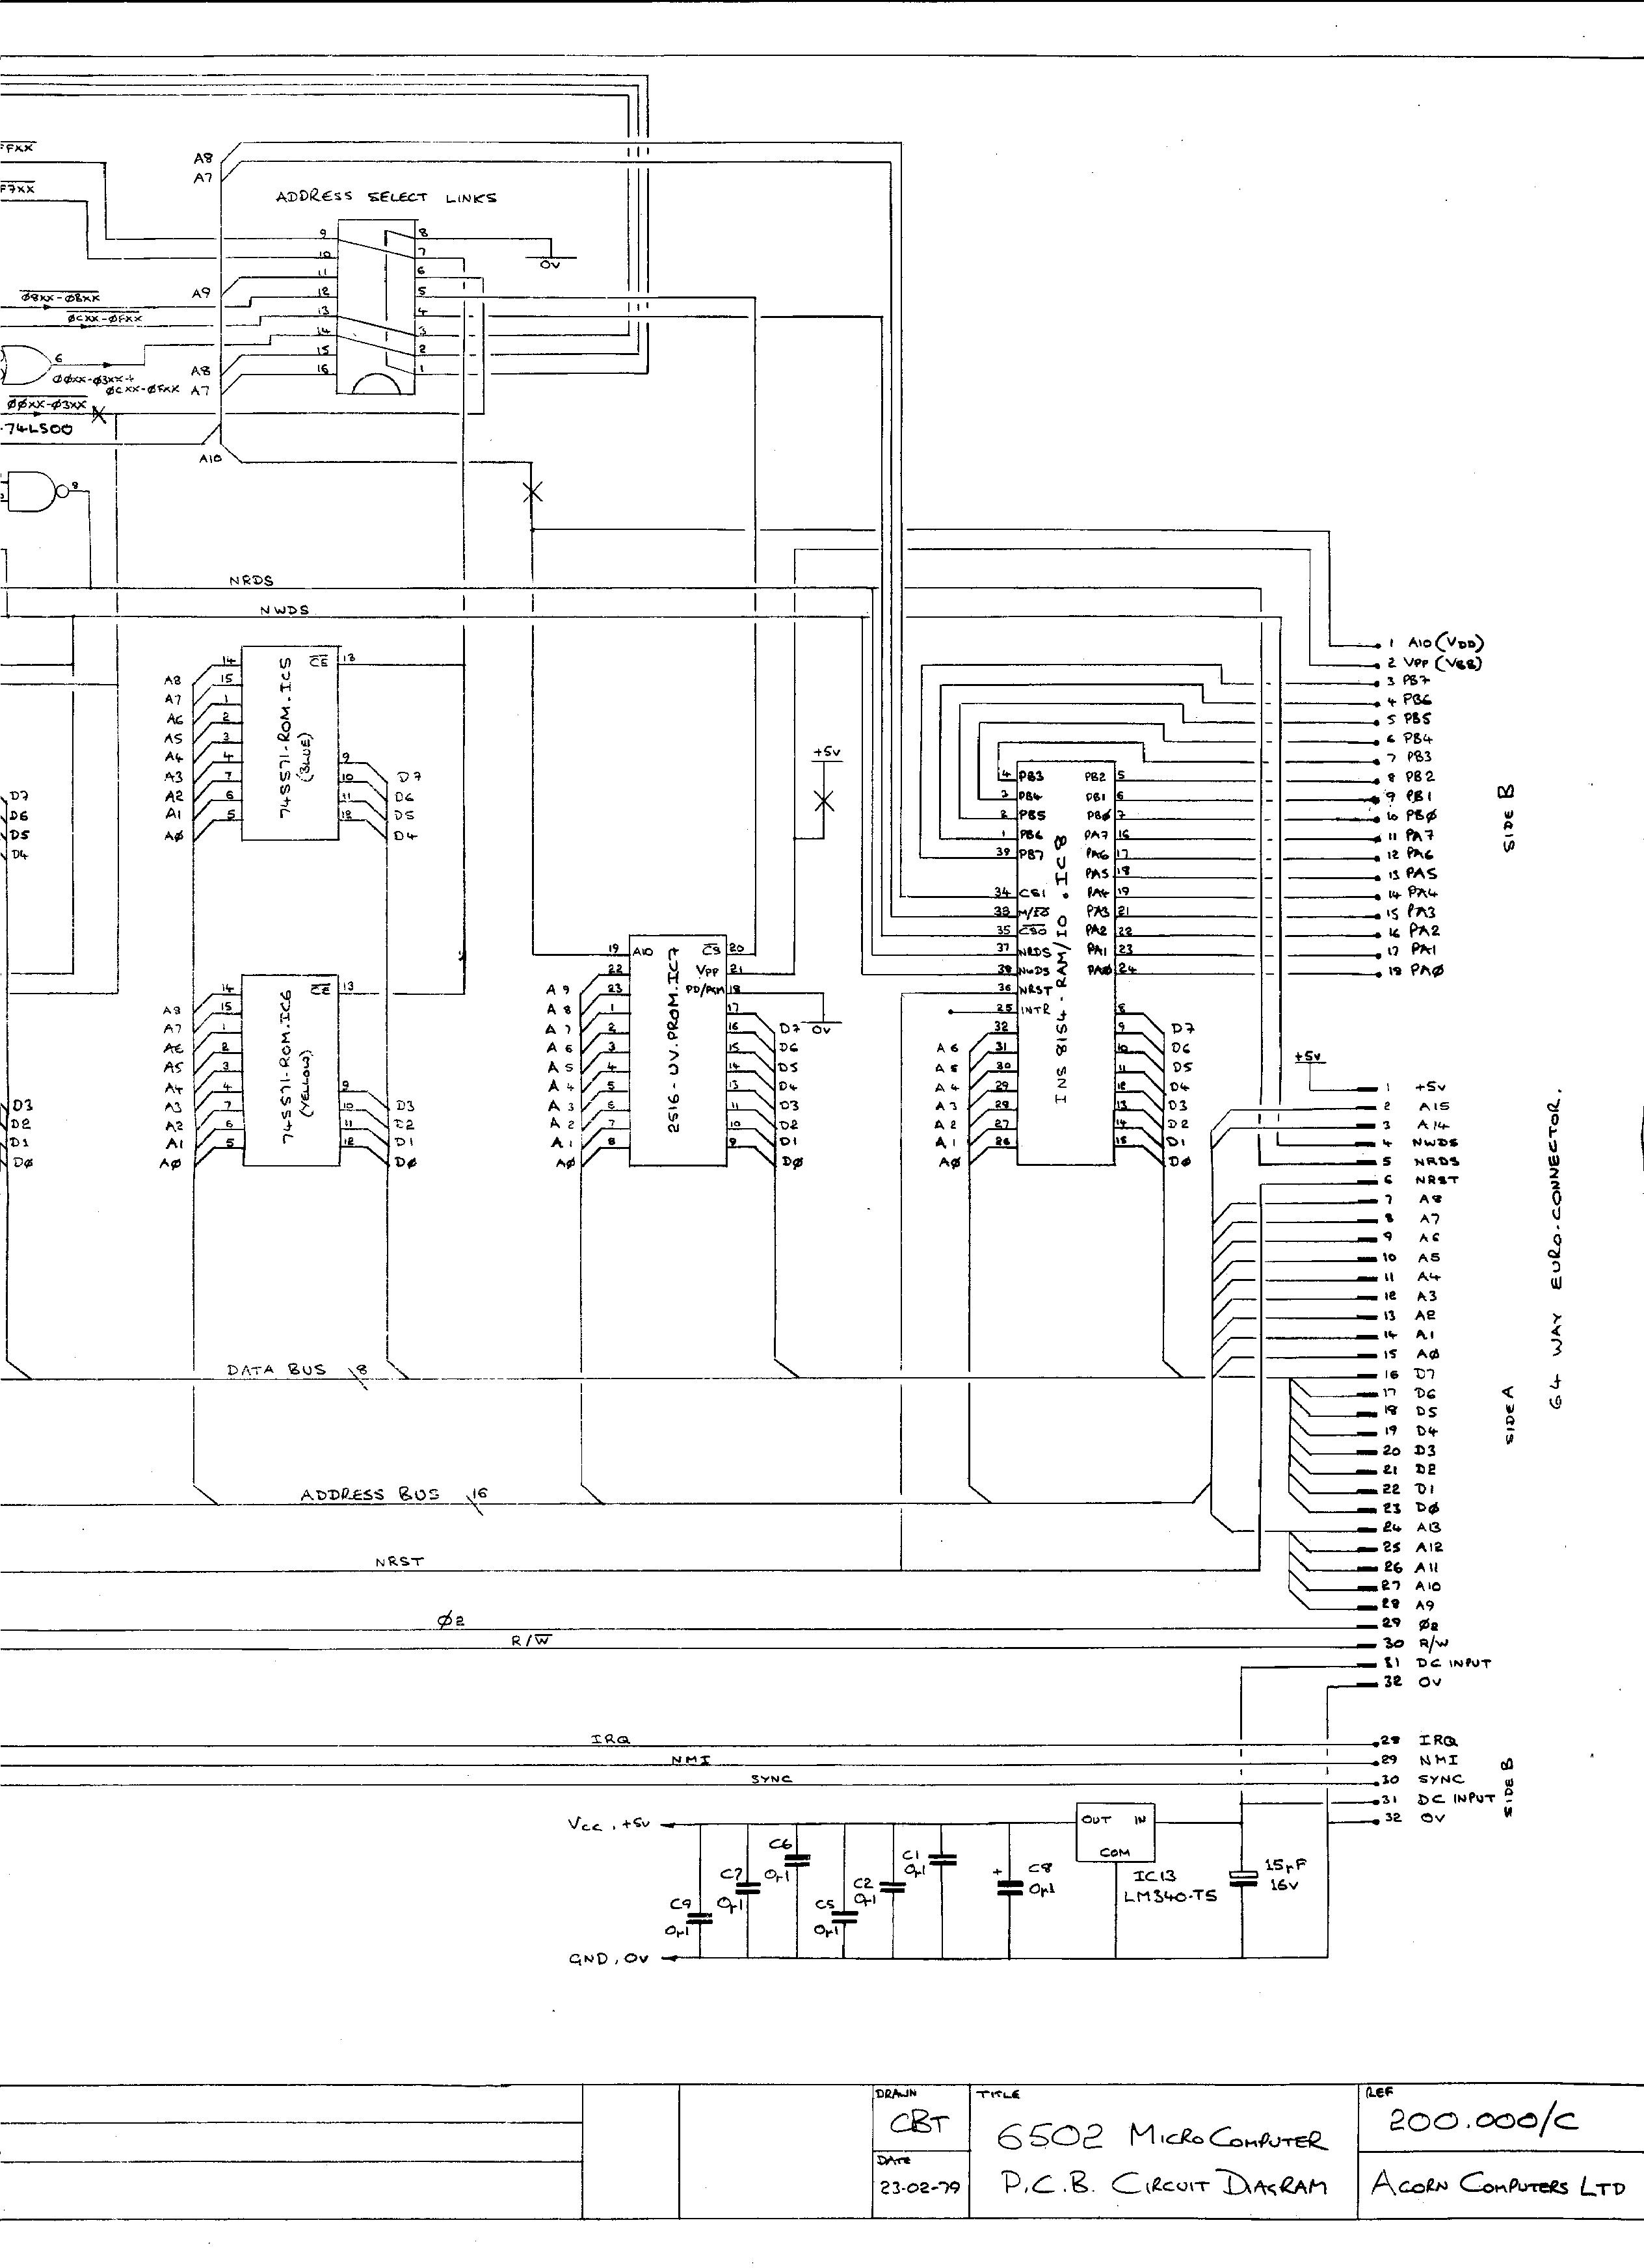 Acorn System 1